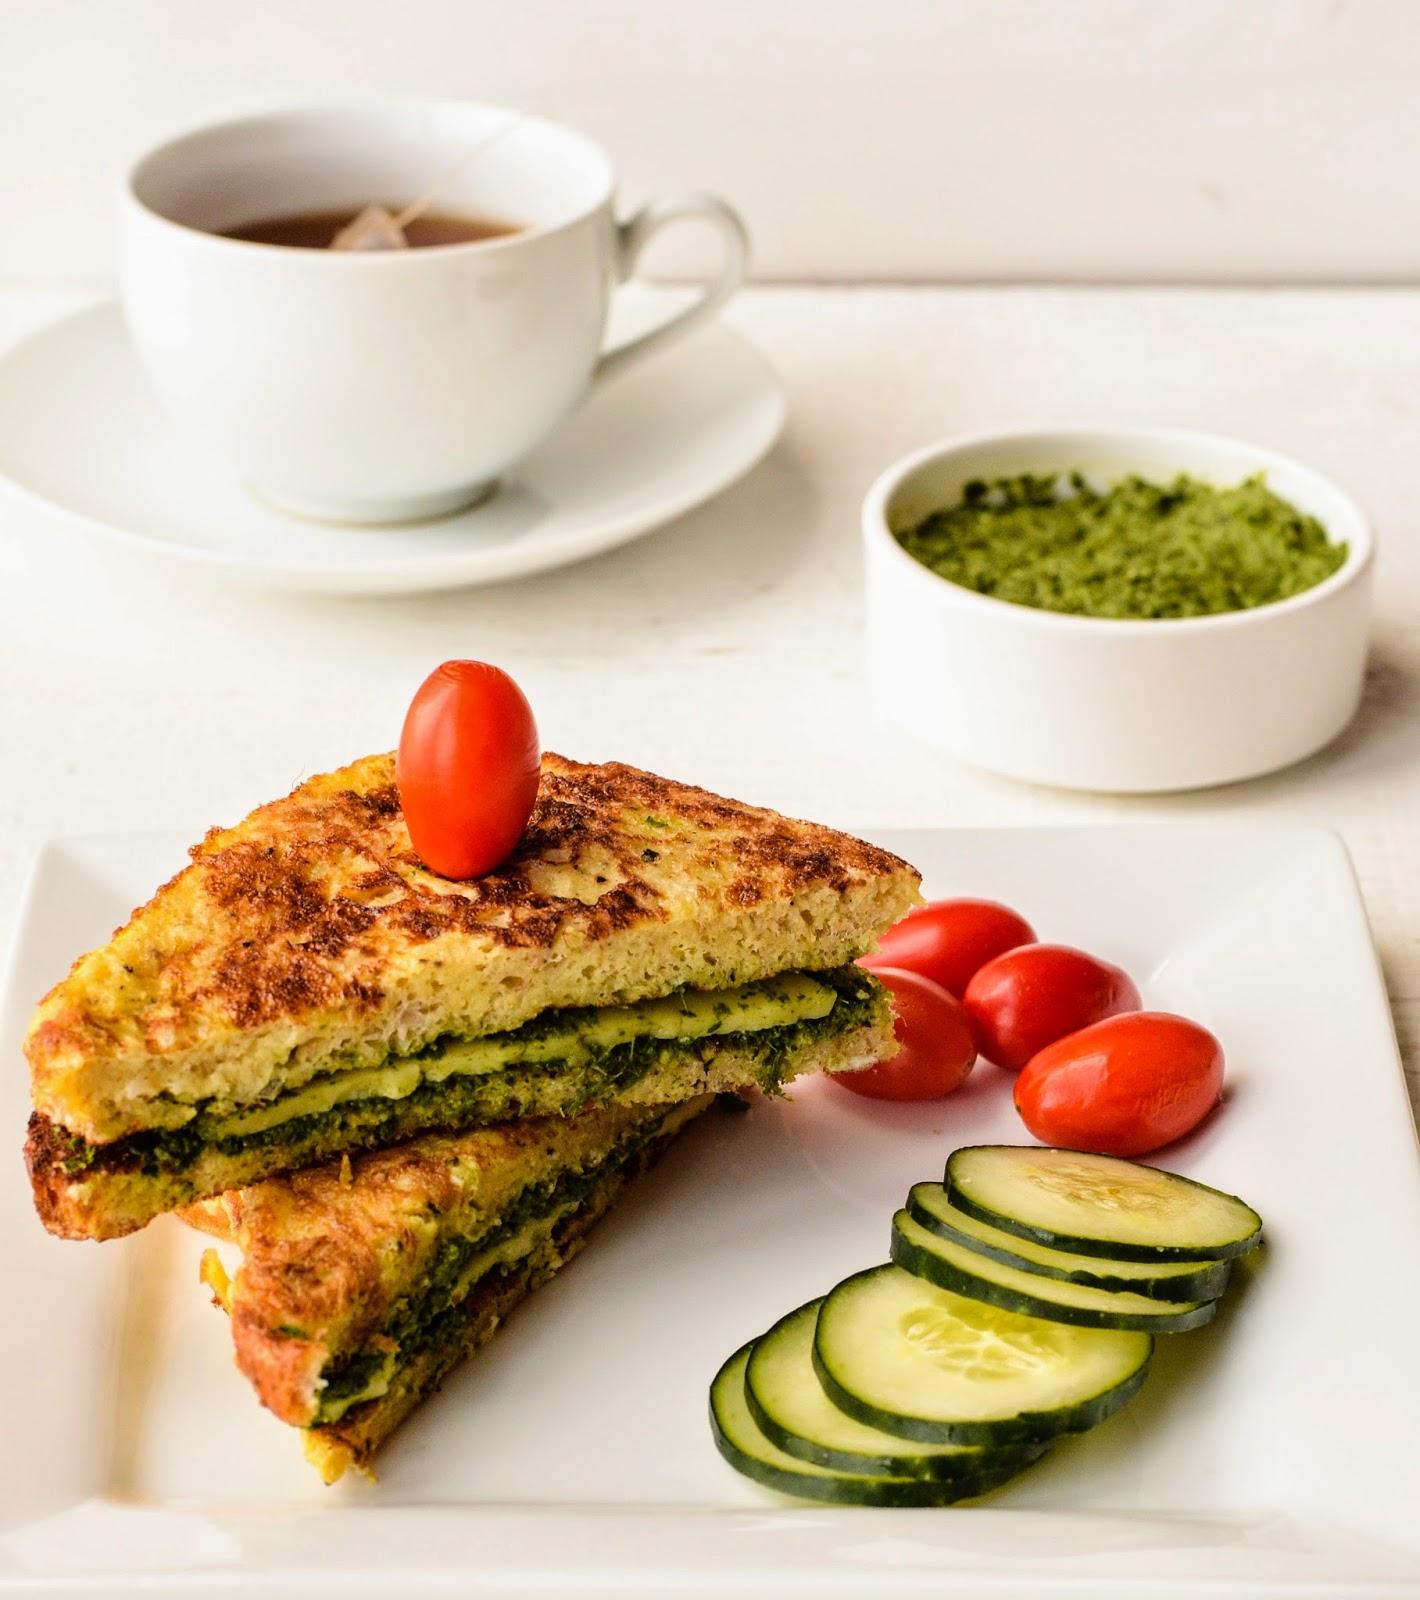 Savory French Toast inspired by Jayati